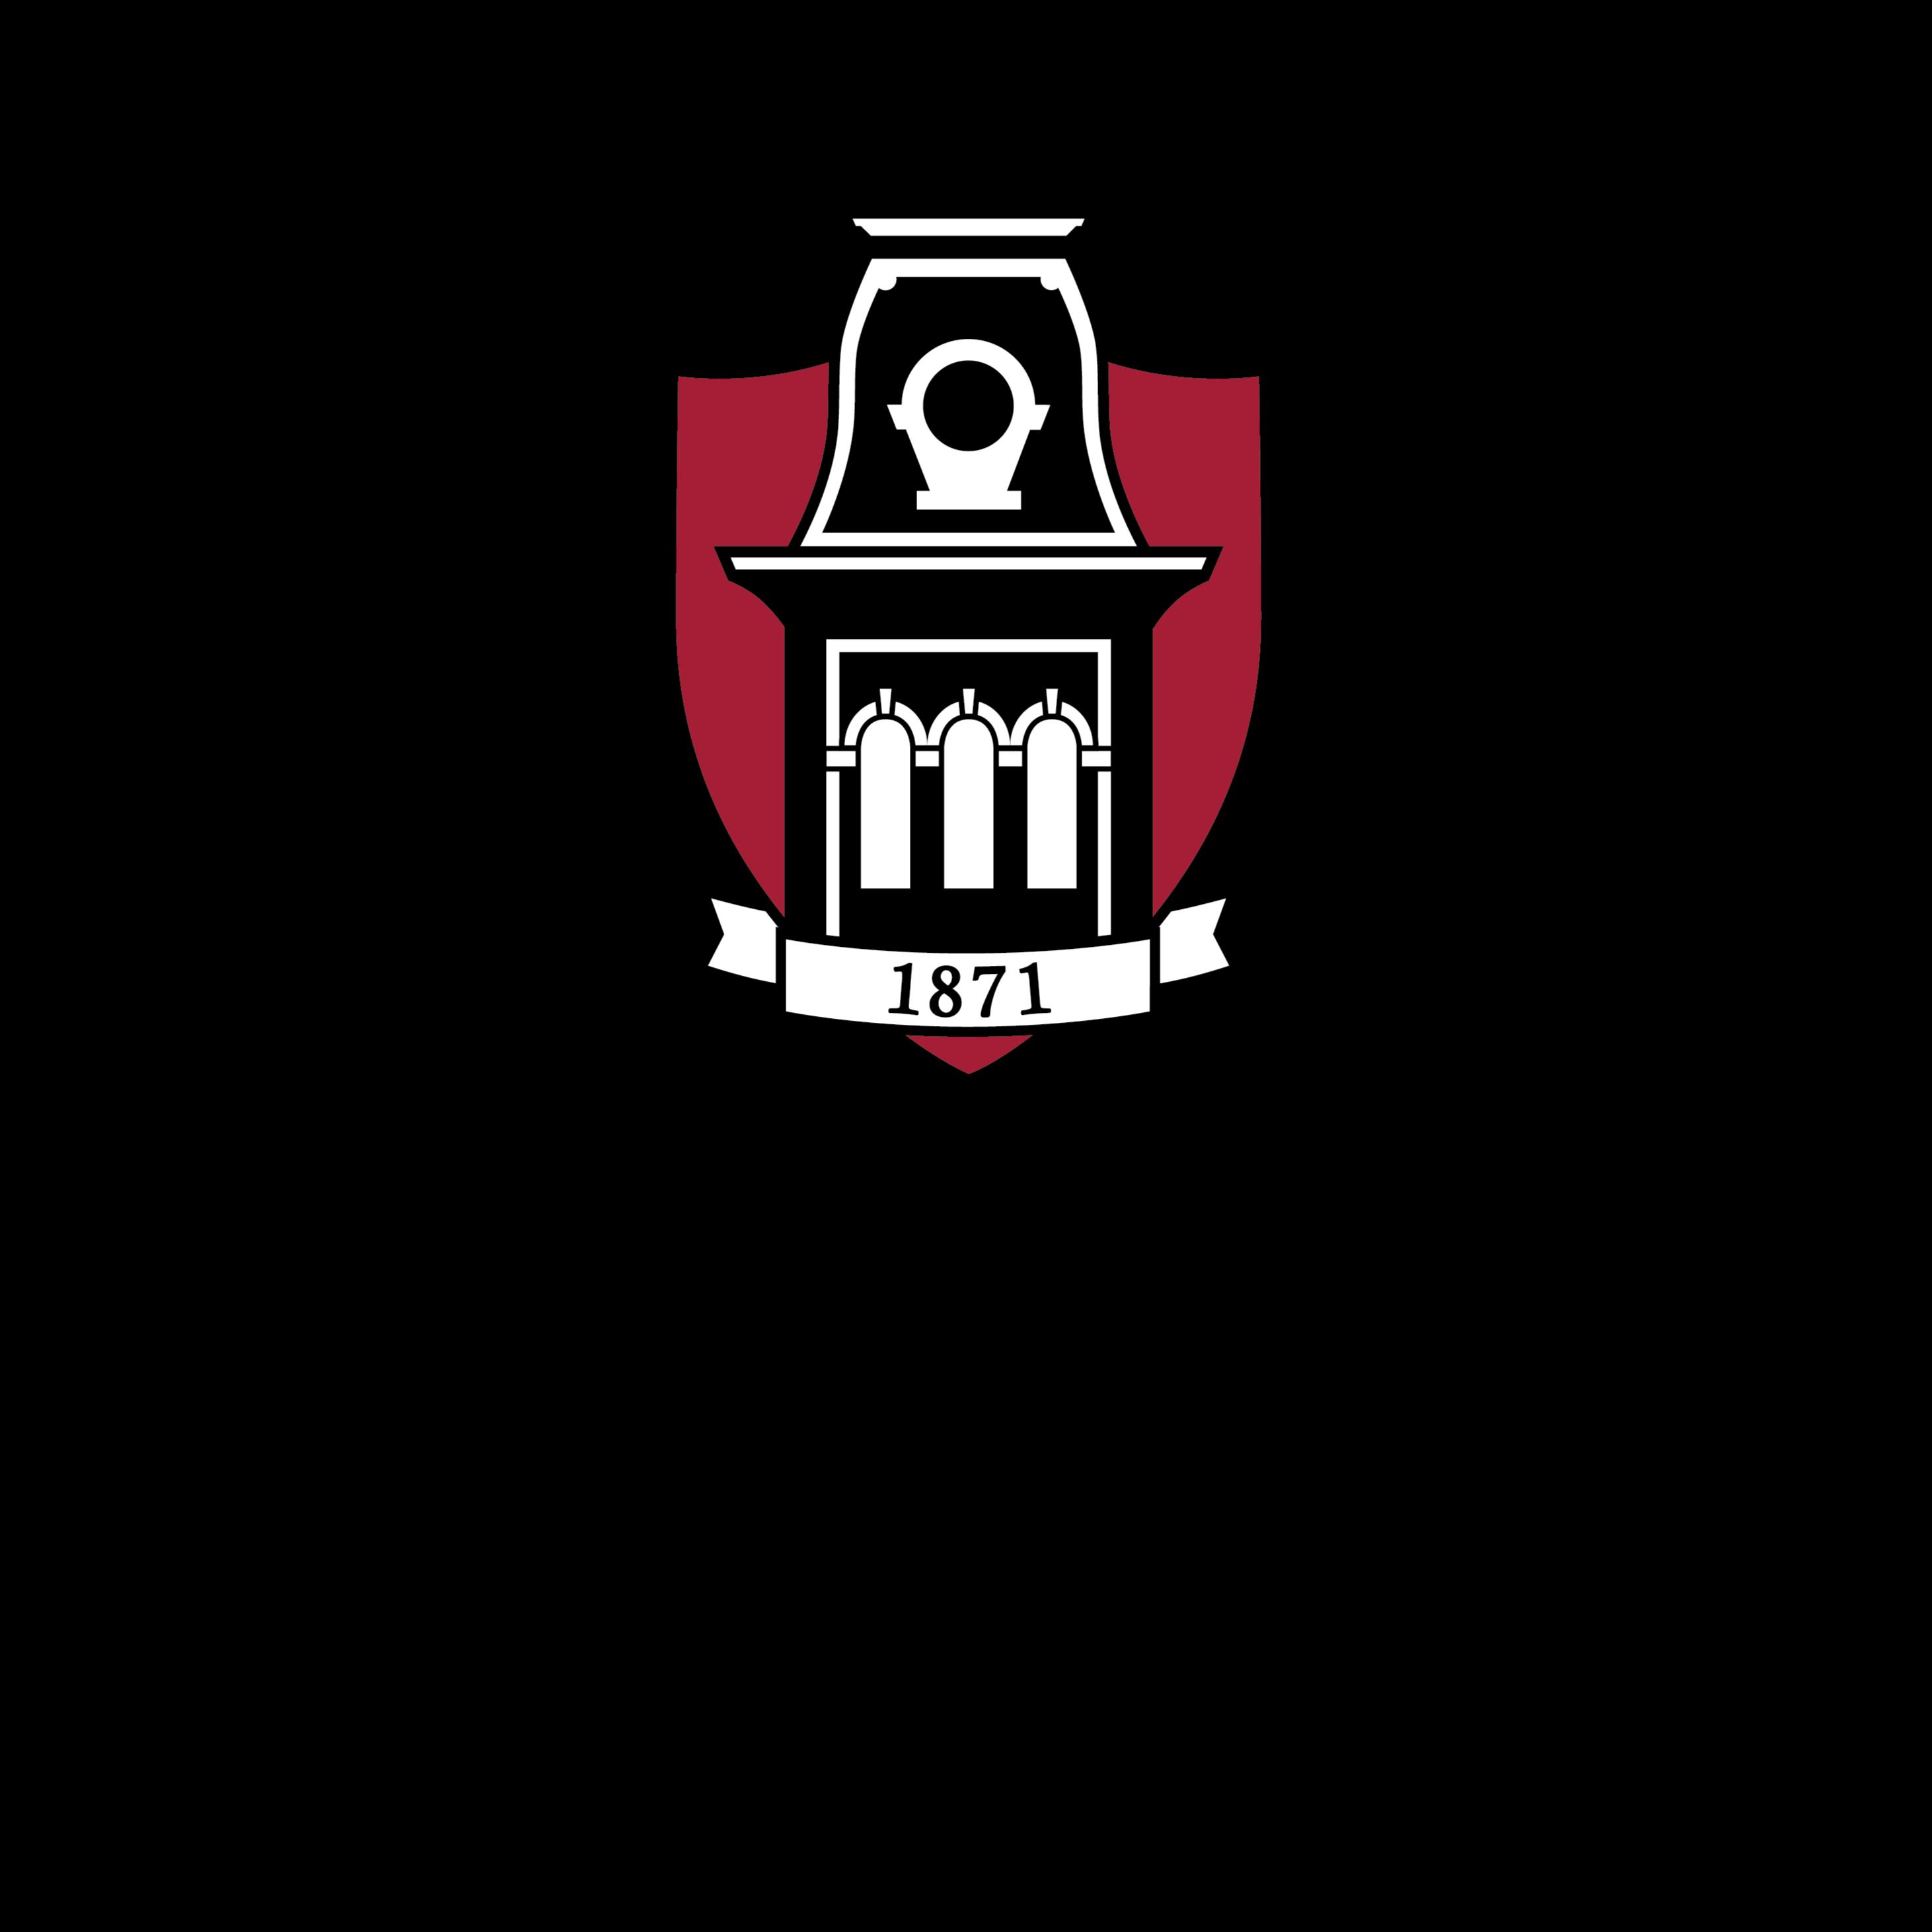 University of Arkansas - Fayetteville